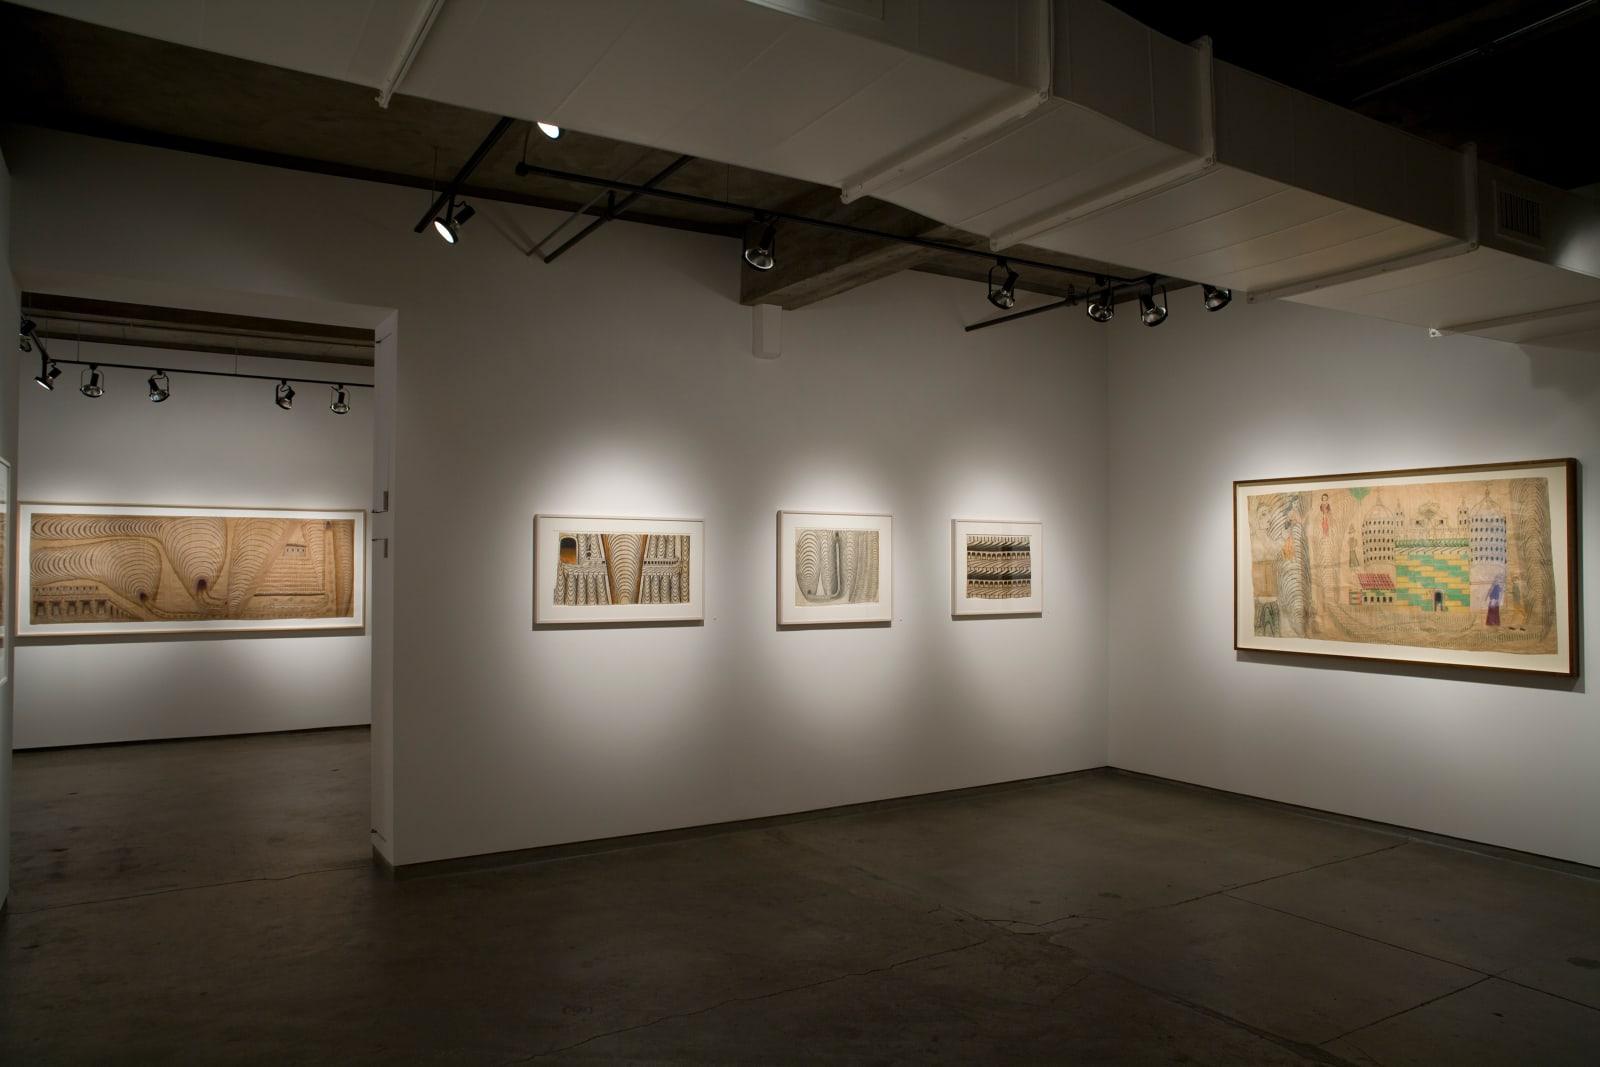 Martin Ramirez: Landscapes